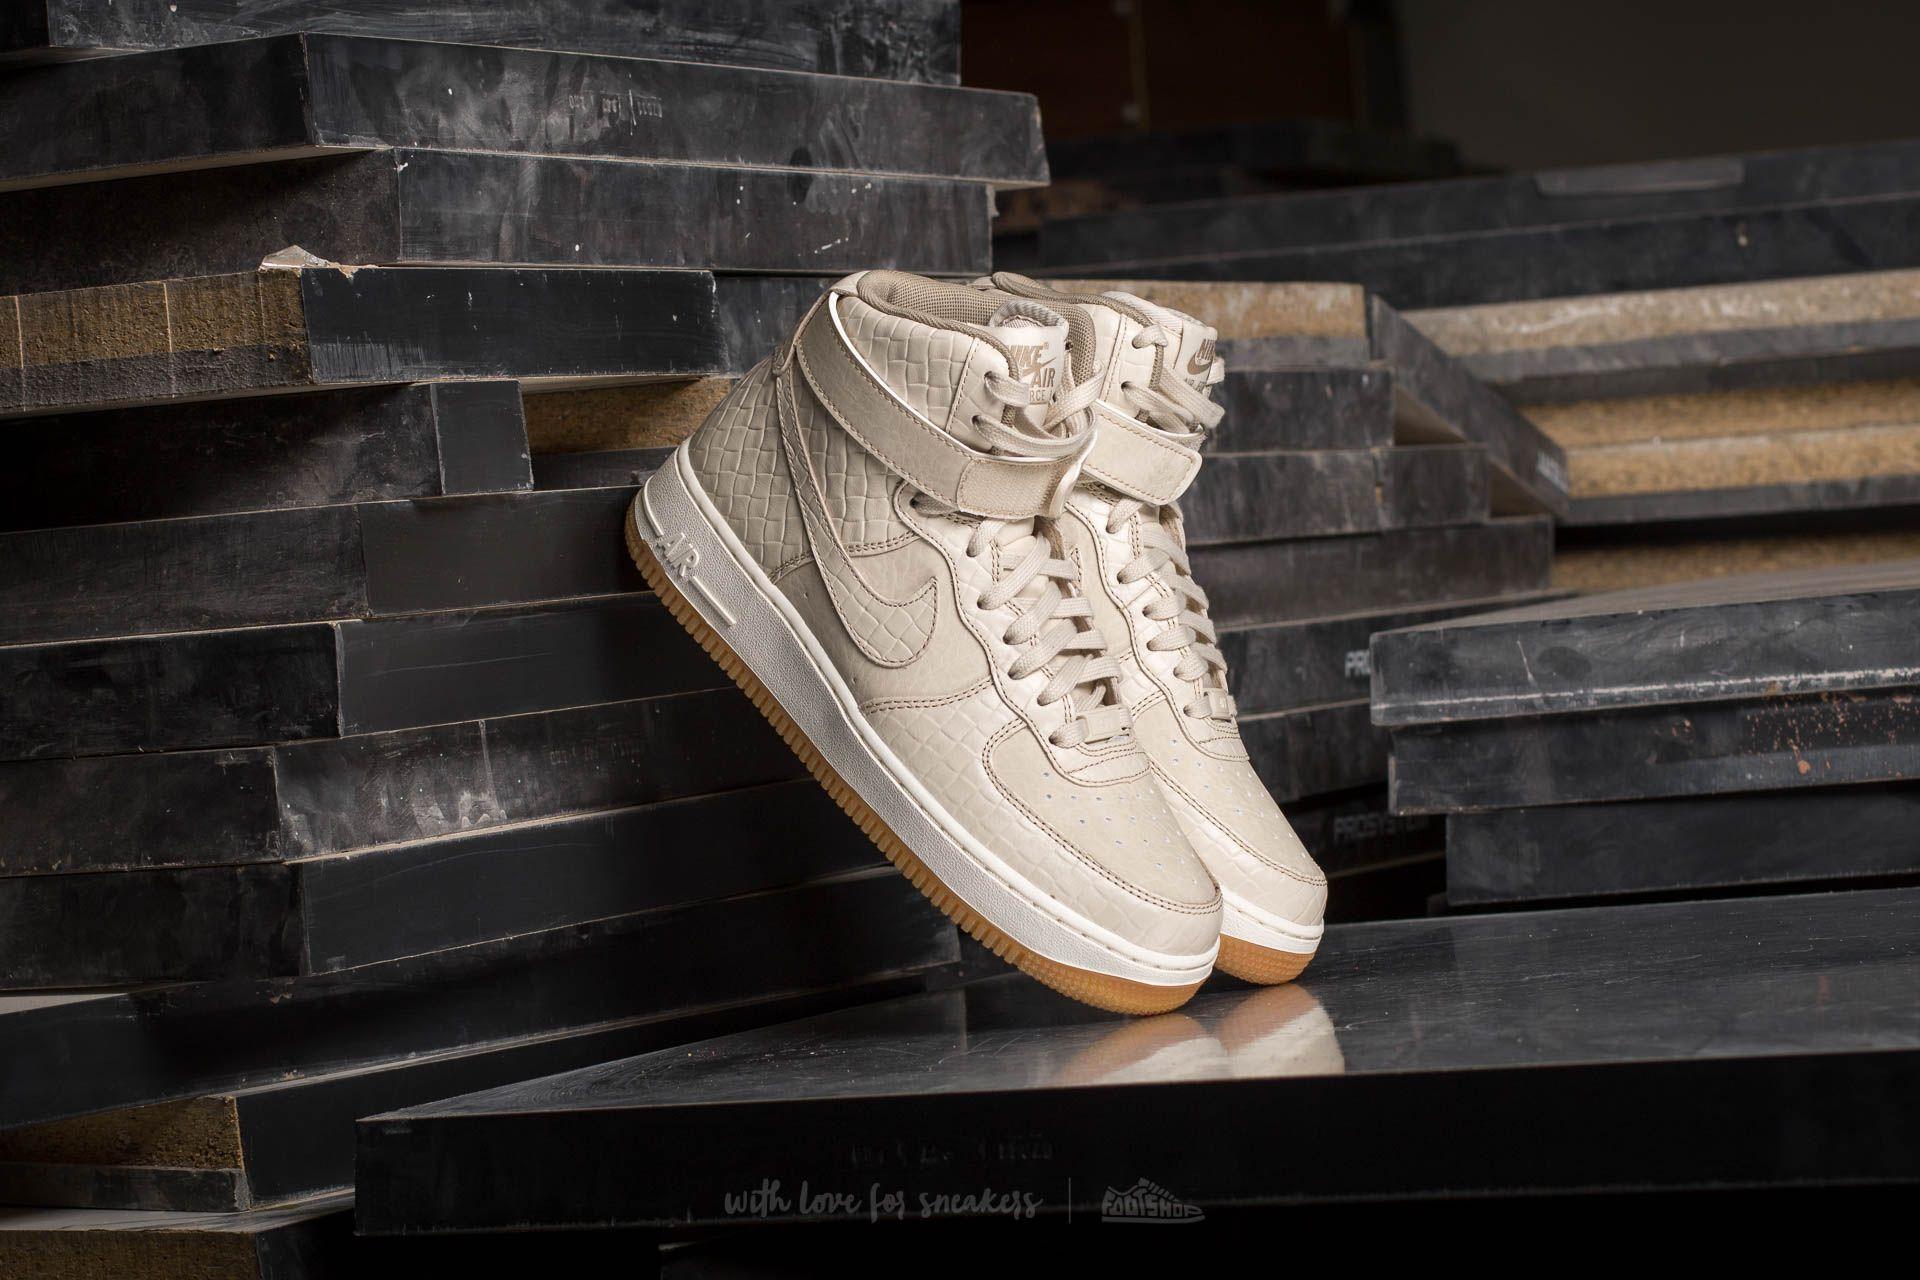 Nike Air Force 1 '07 Mid Leather Premium Oatmeal Black